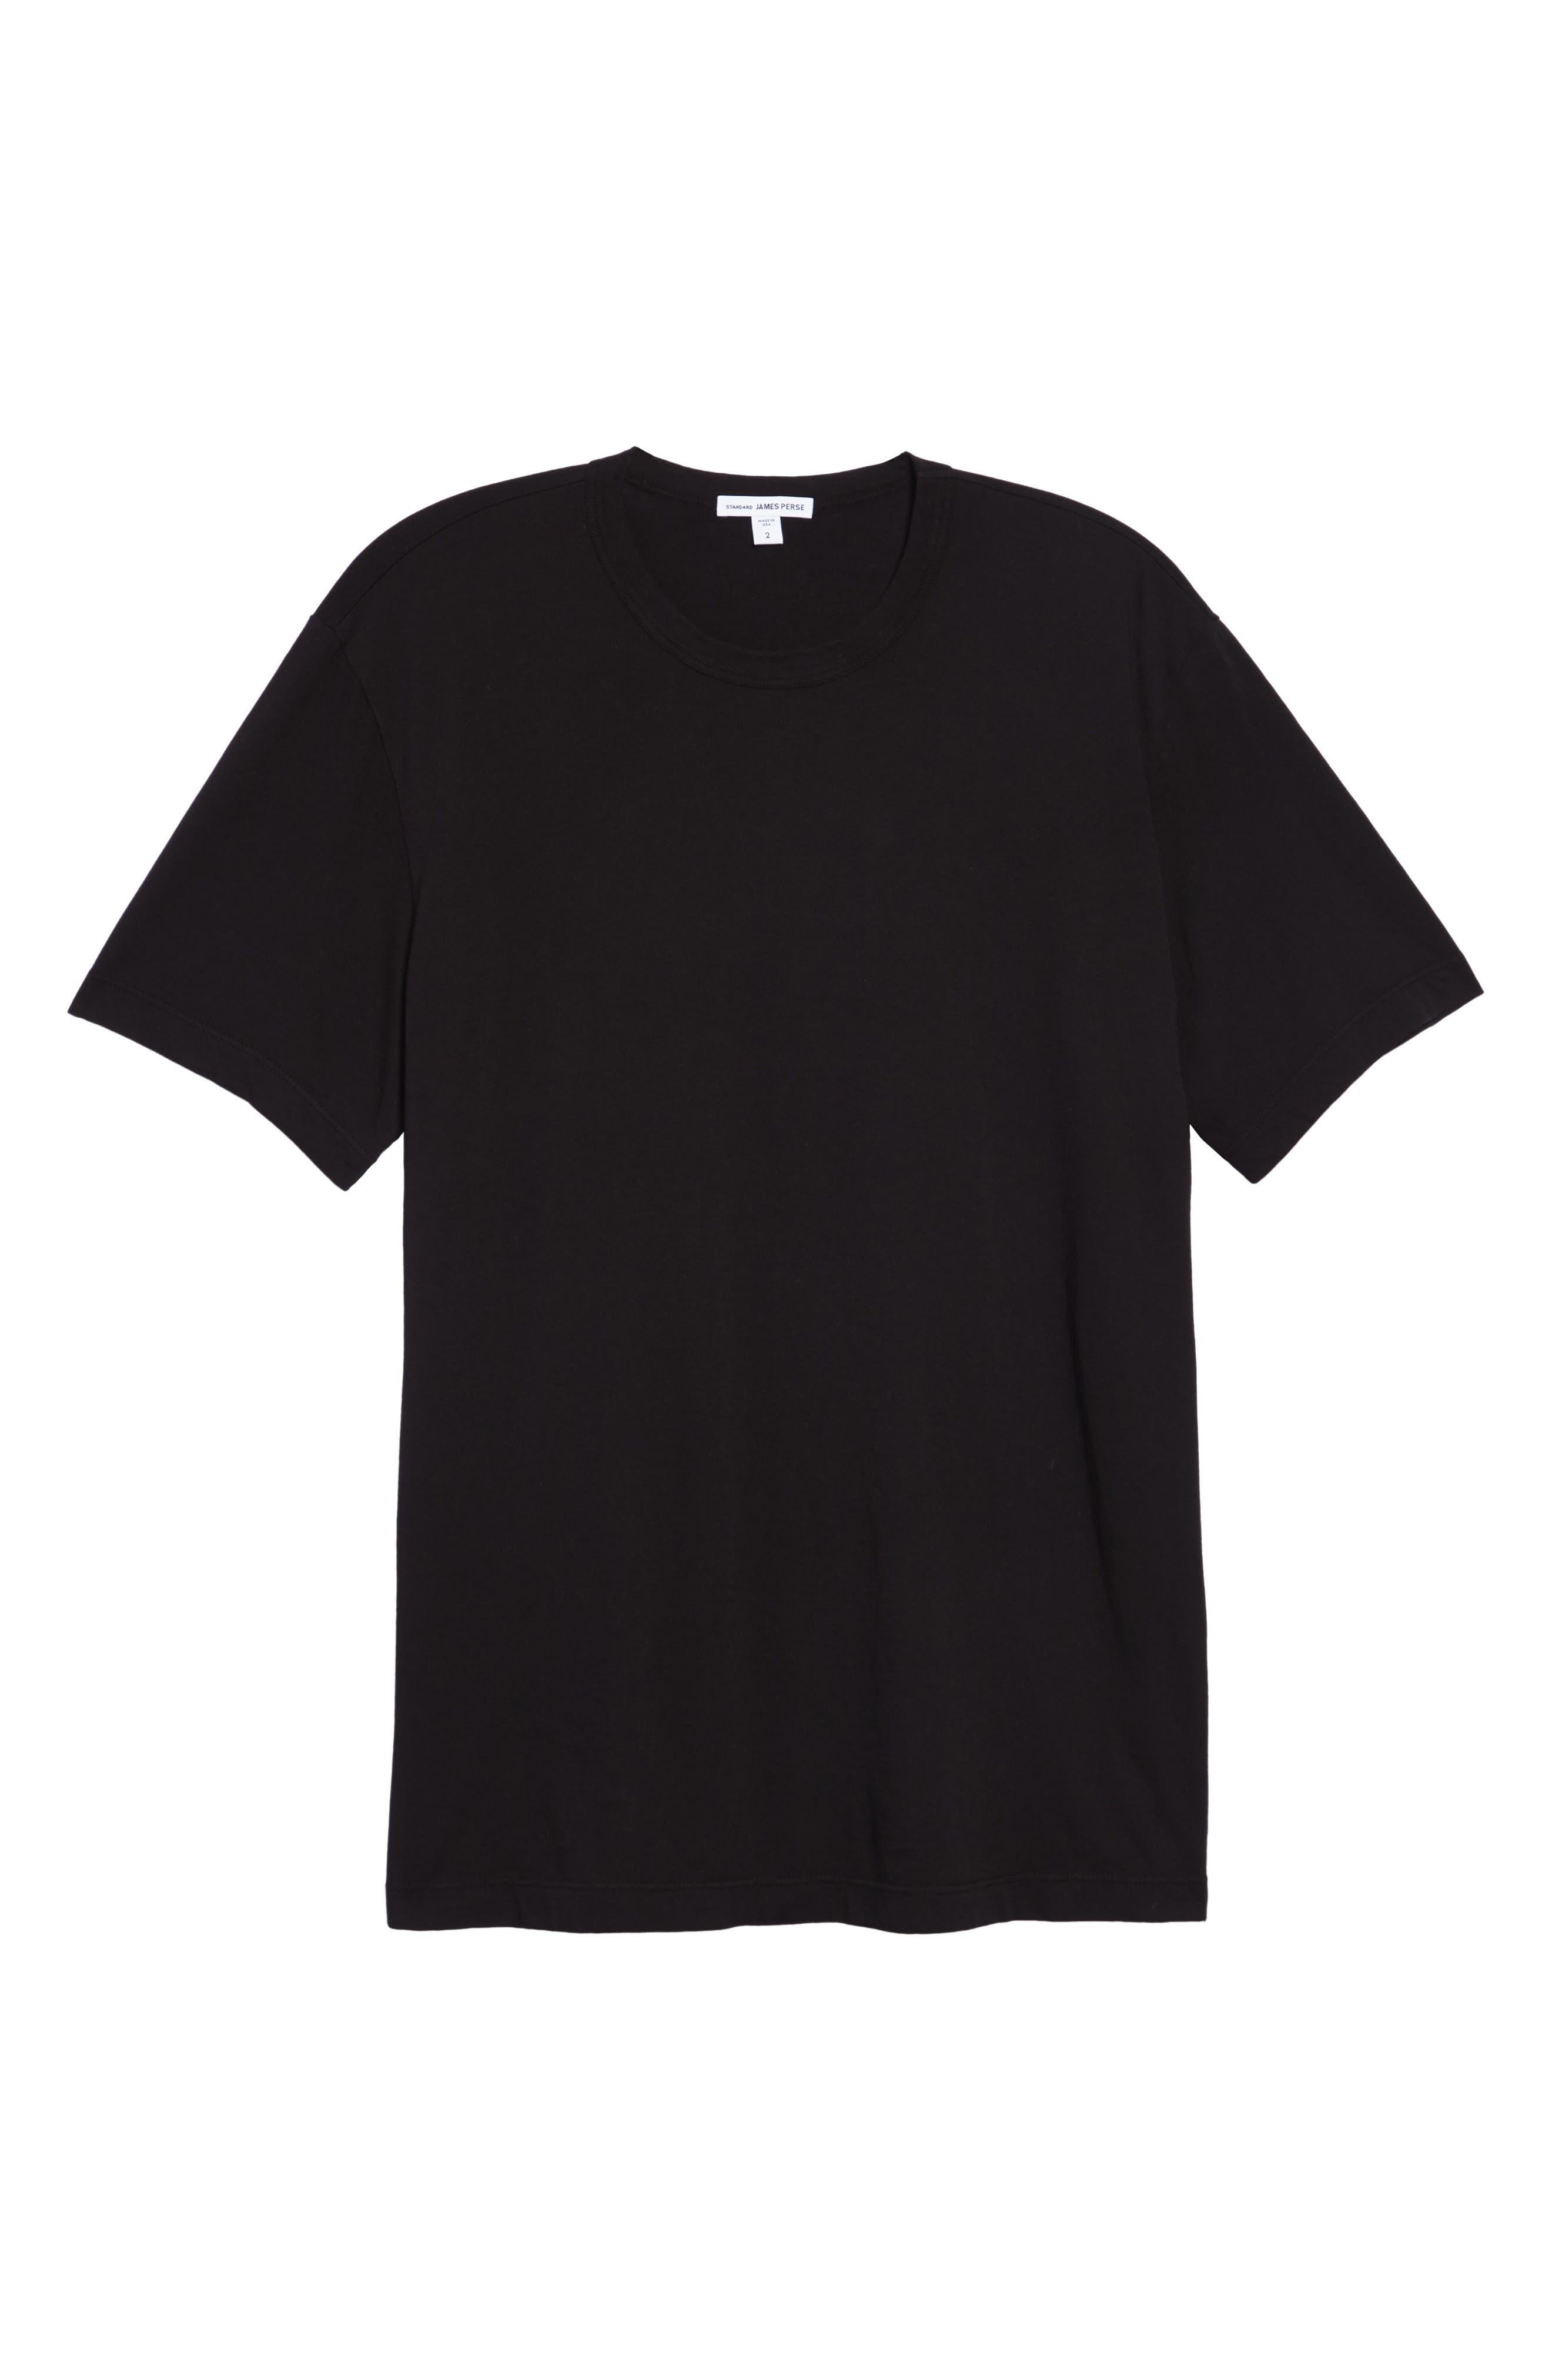 JAMES PERSE, Crewneck Jersey T-Shirt, Main thumbnail 1, color, BLACK